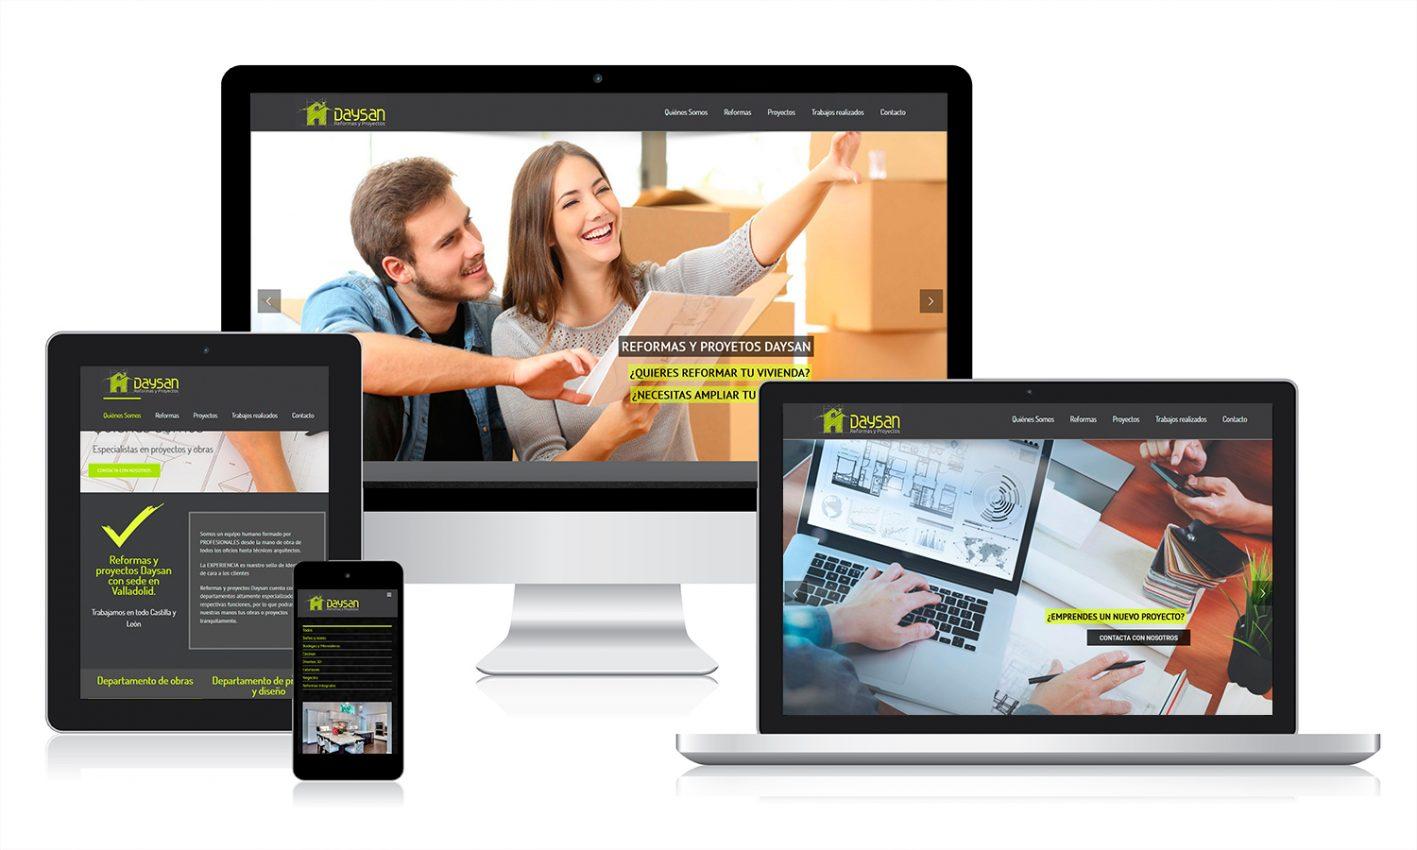 Diseño resoponsive en diferentes pantallas para web Daysan